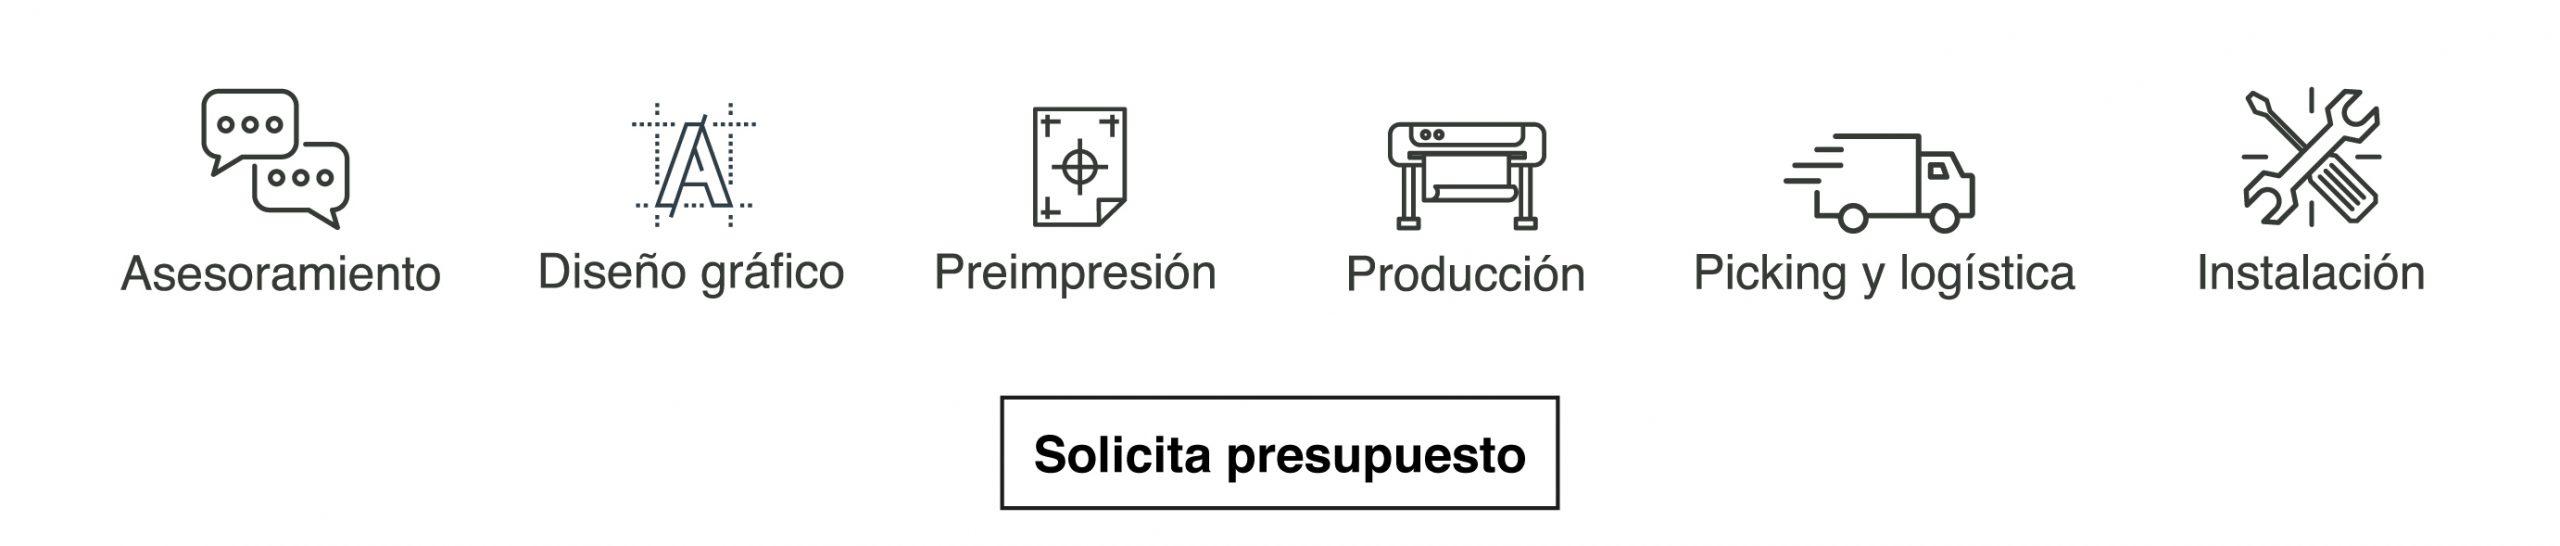 servicios impresión gran formato